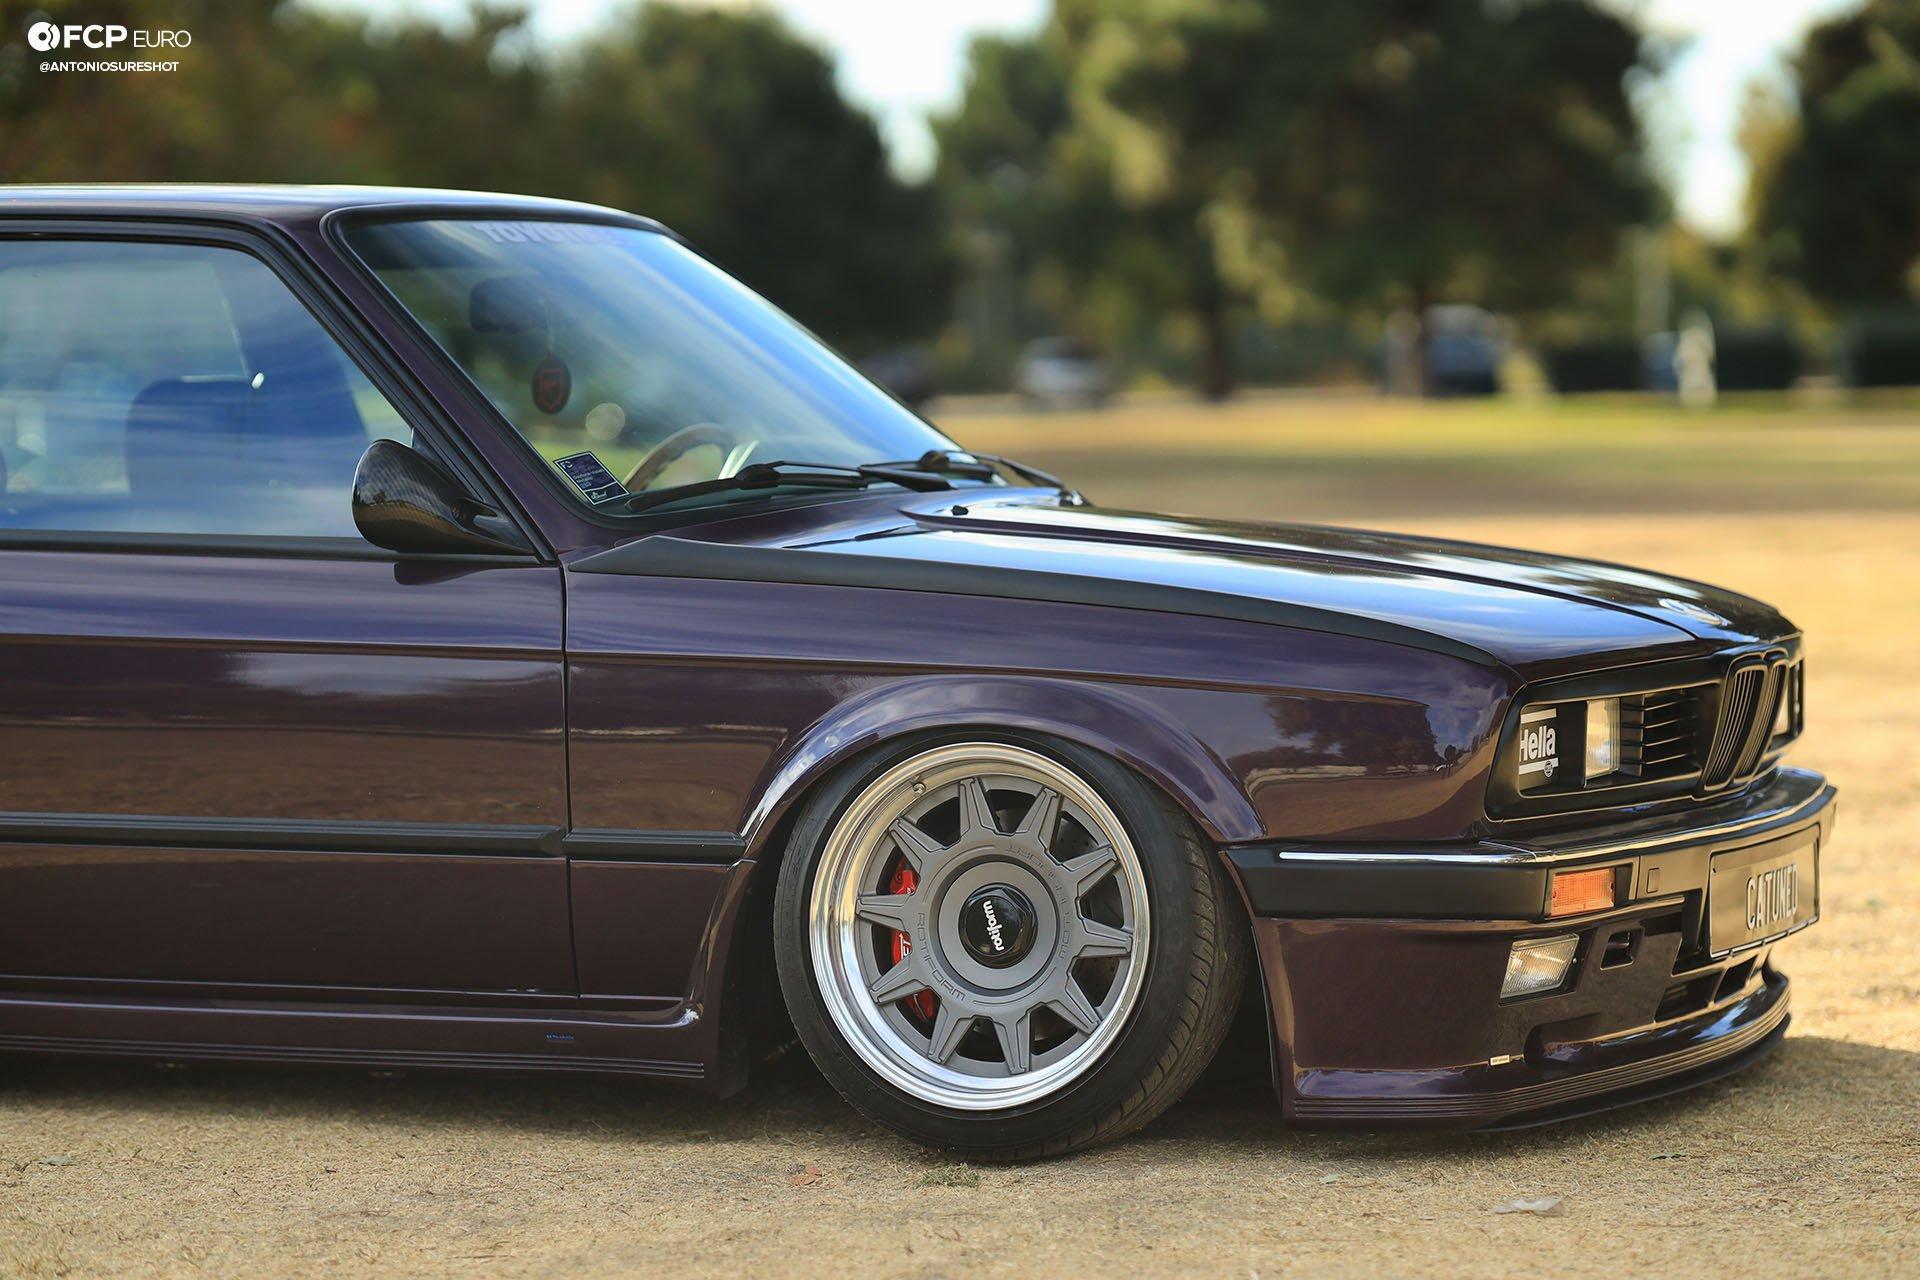 CAtuned Daytona Violet E30 BMW Rotiform SAC Wheels